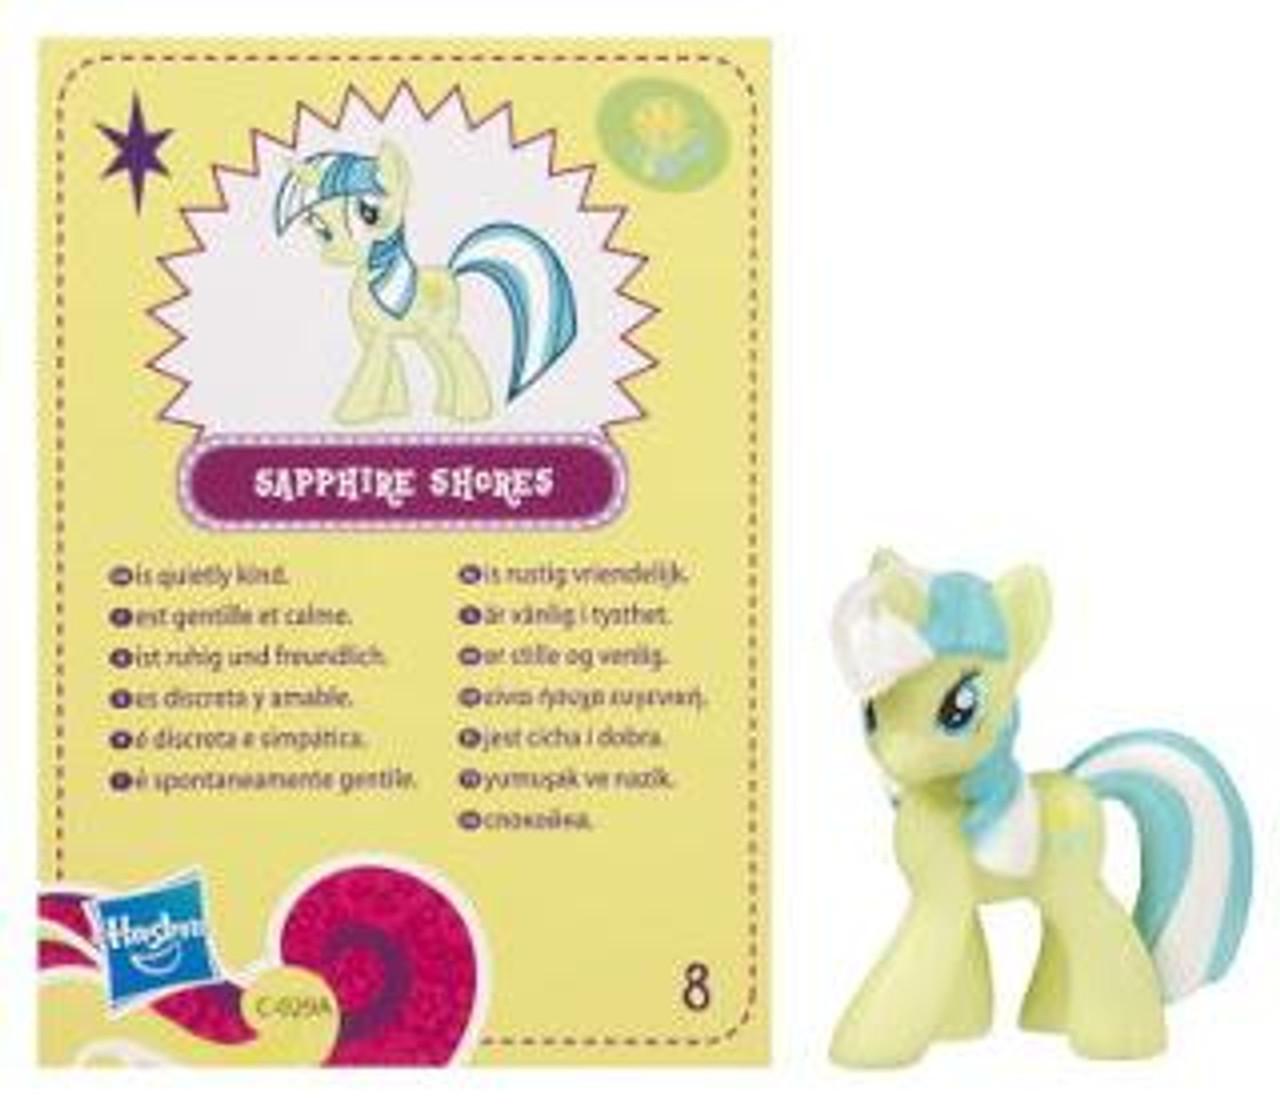 My Little Pony Series 4 Sapphire Shores 2-Inch PVC Figure